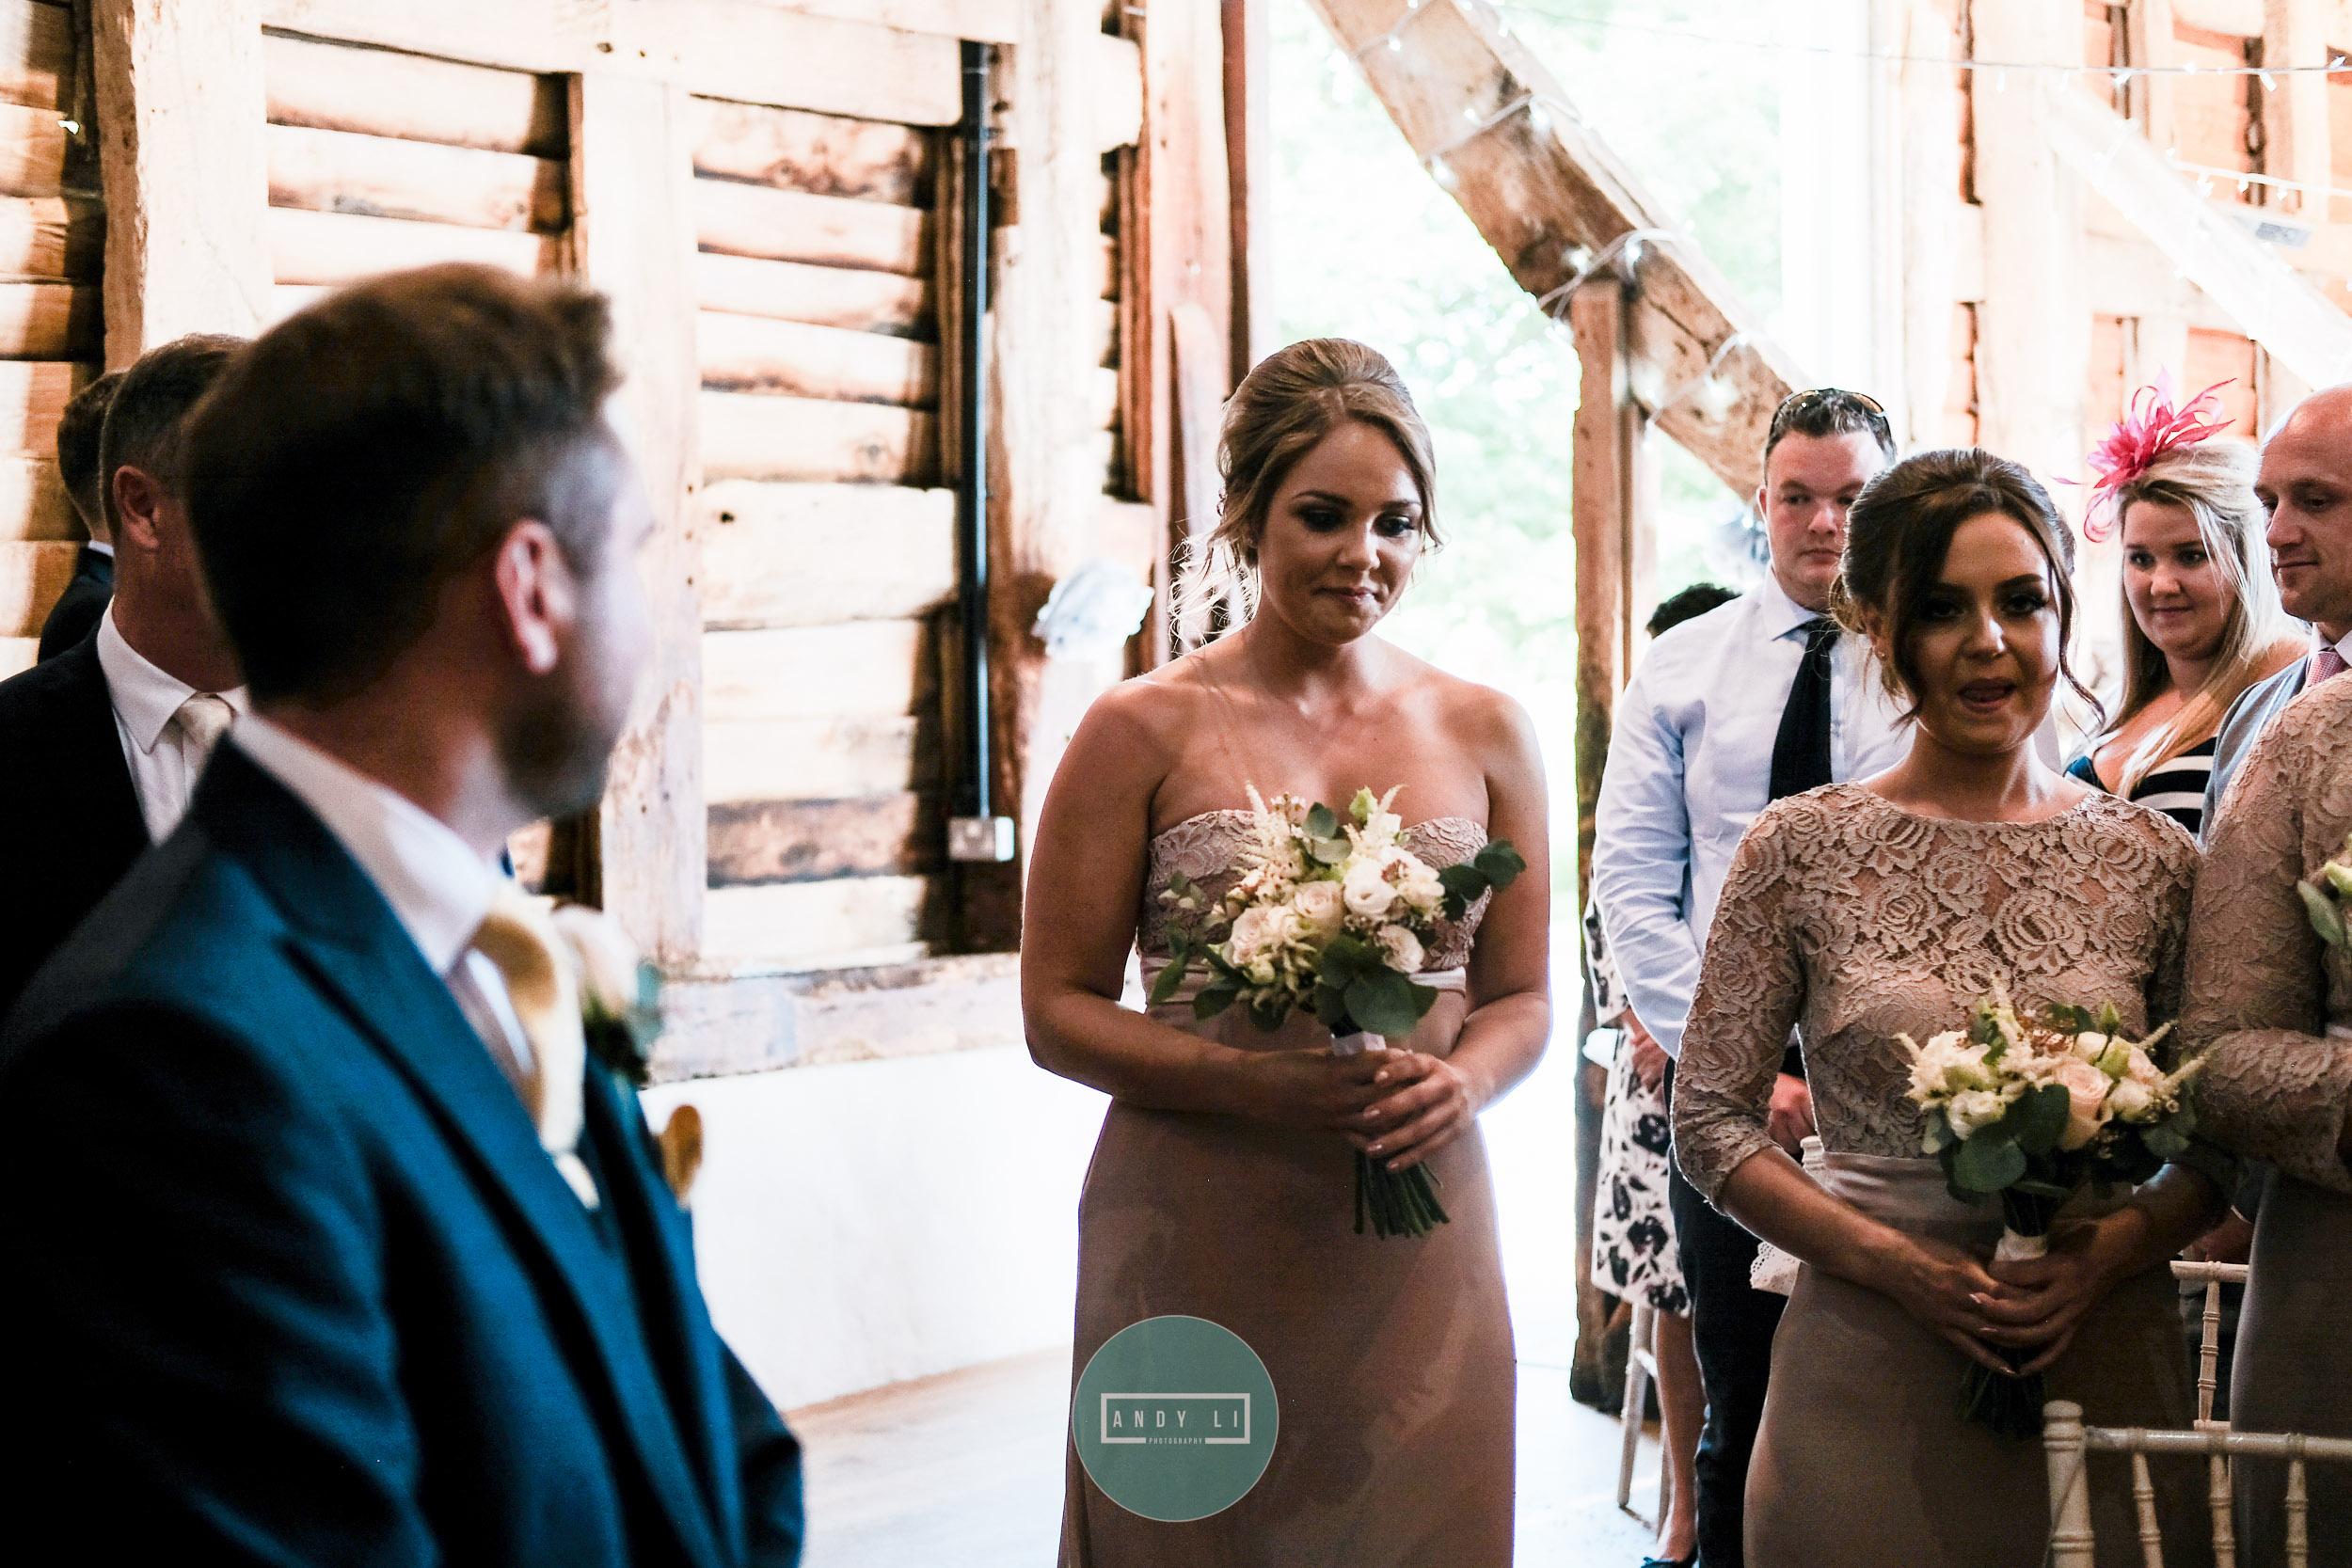 Pimhill Barn Wedding Photographer-057-DSCF0121.jpg